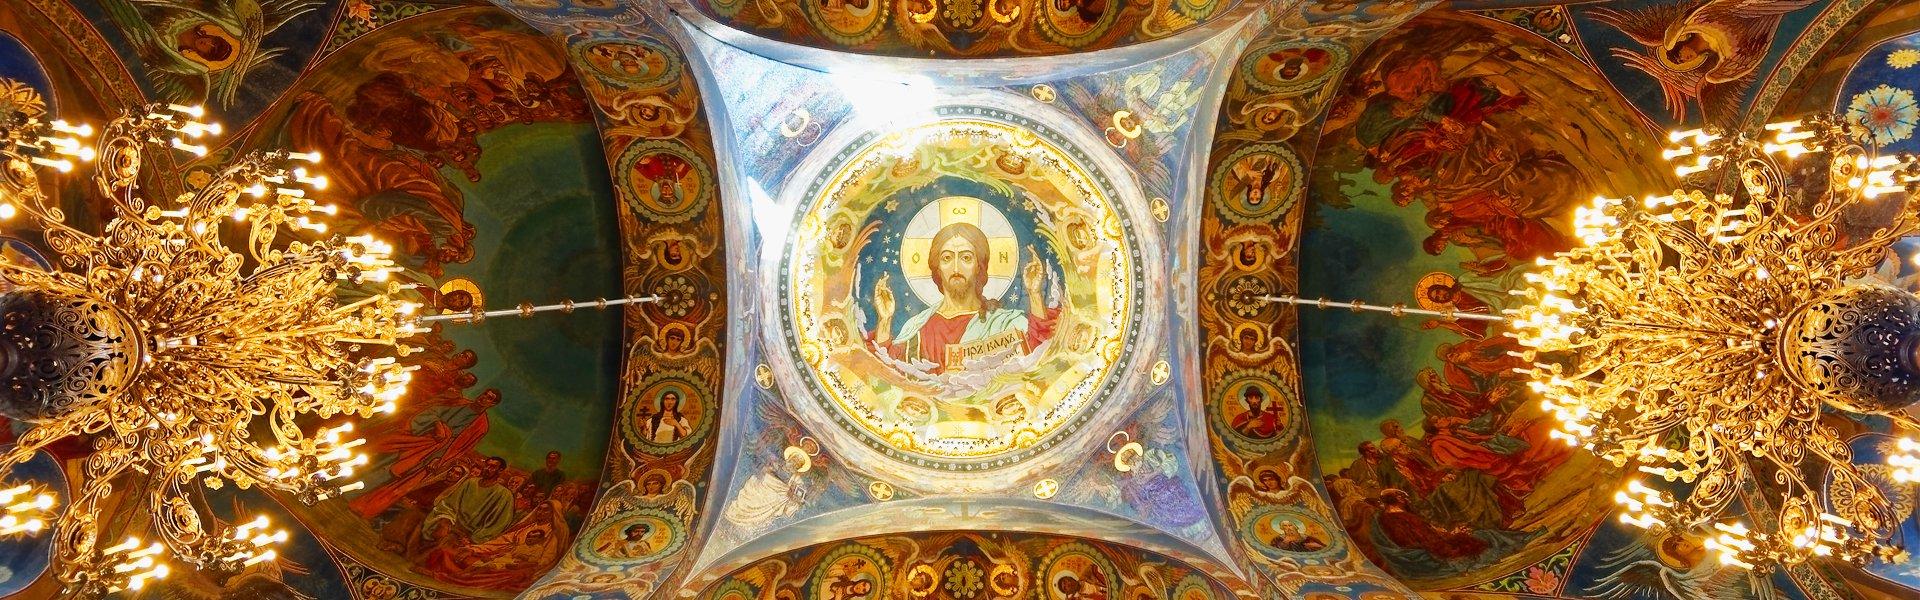 Rusland, kerk